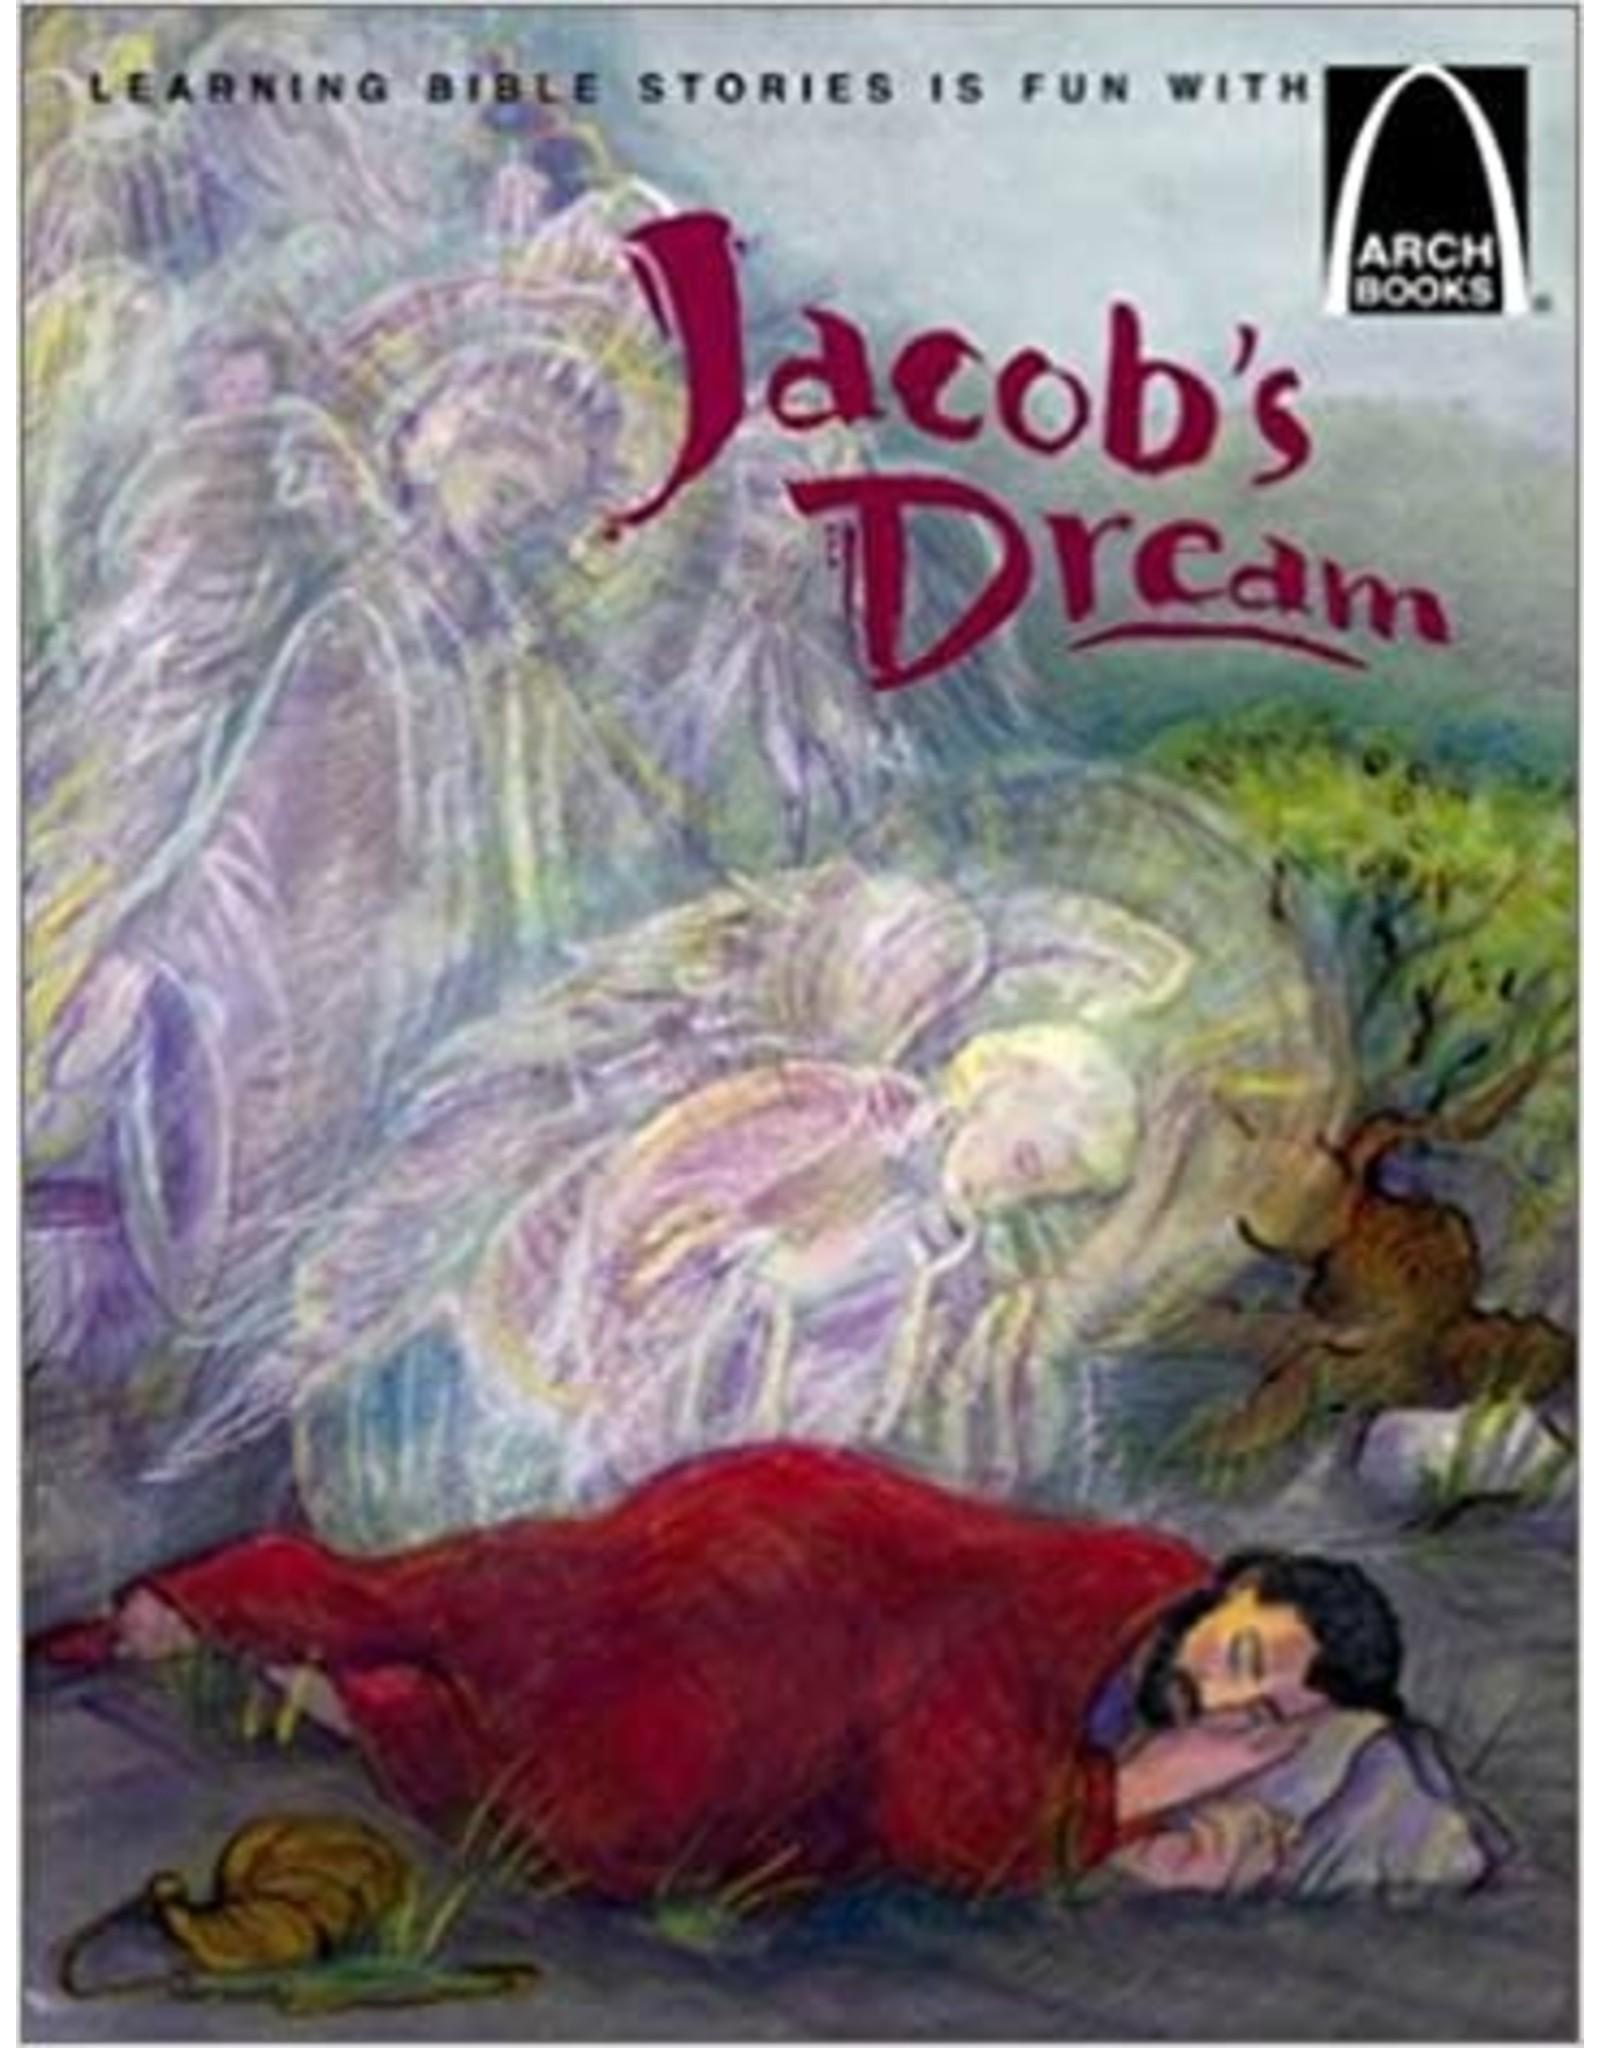 Jacob's Dream - Arch Books